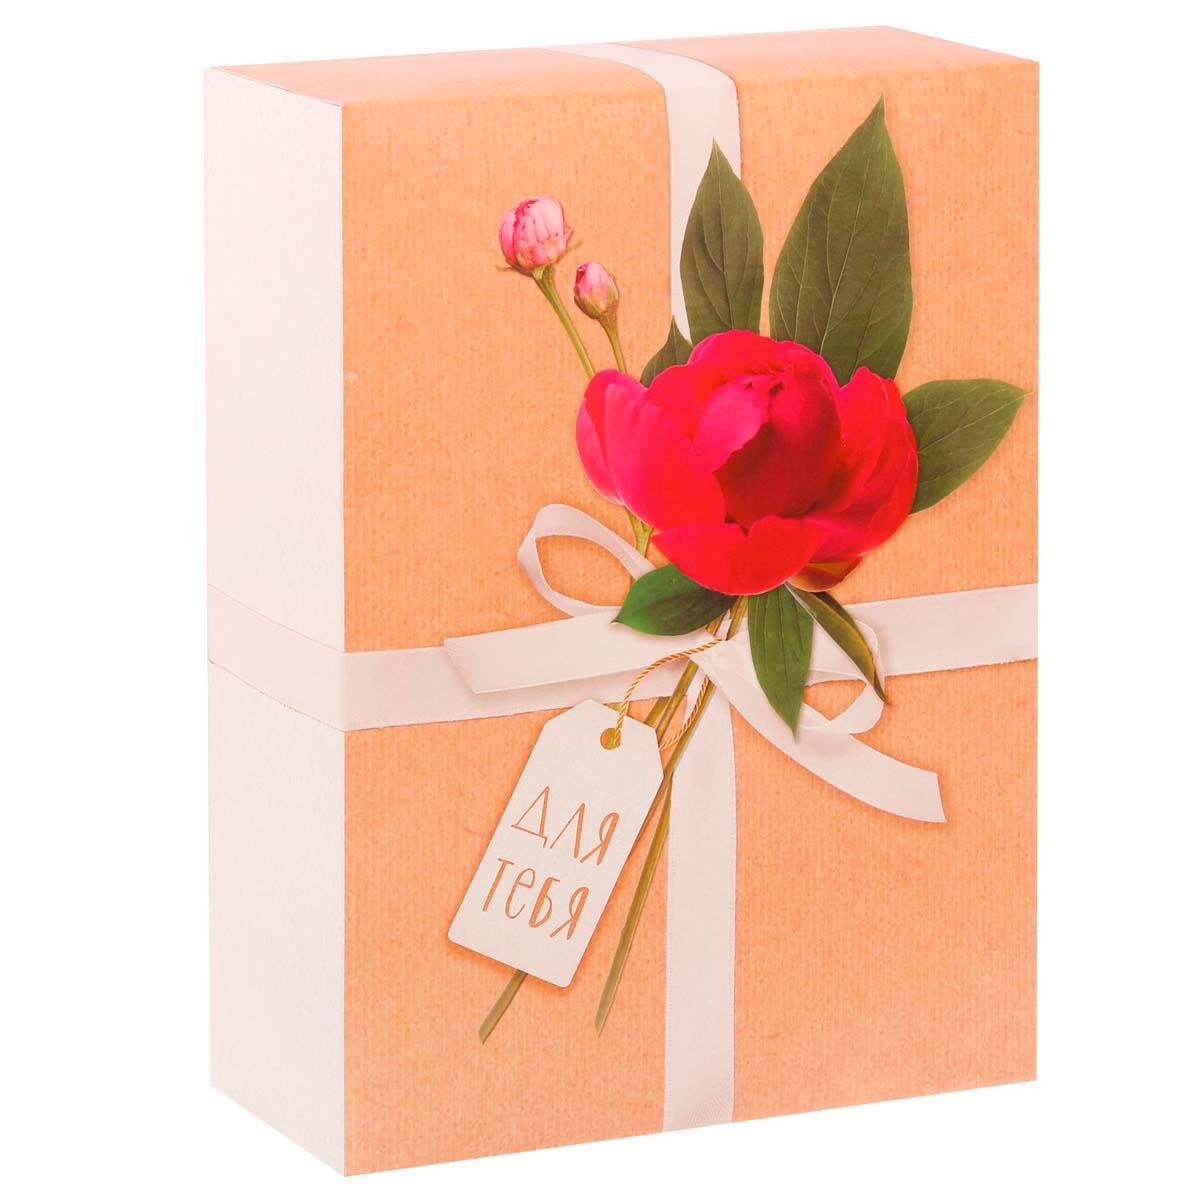 3122708 Складная коробка «Нежный цветок», 22 х 30 х 10 см